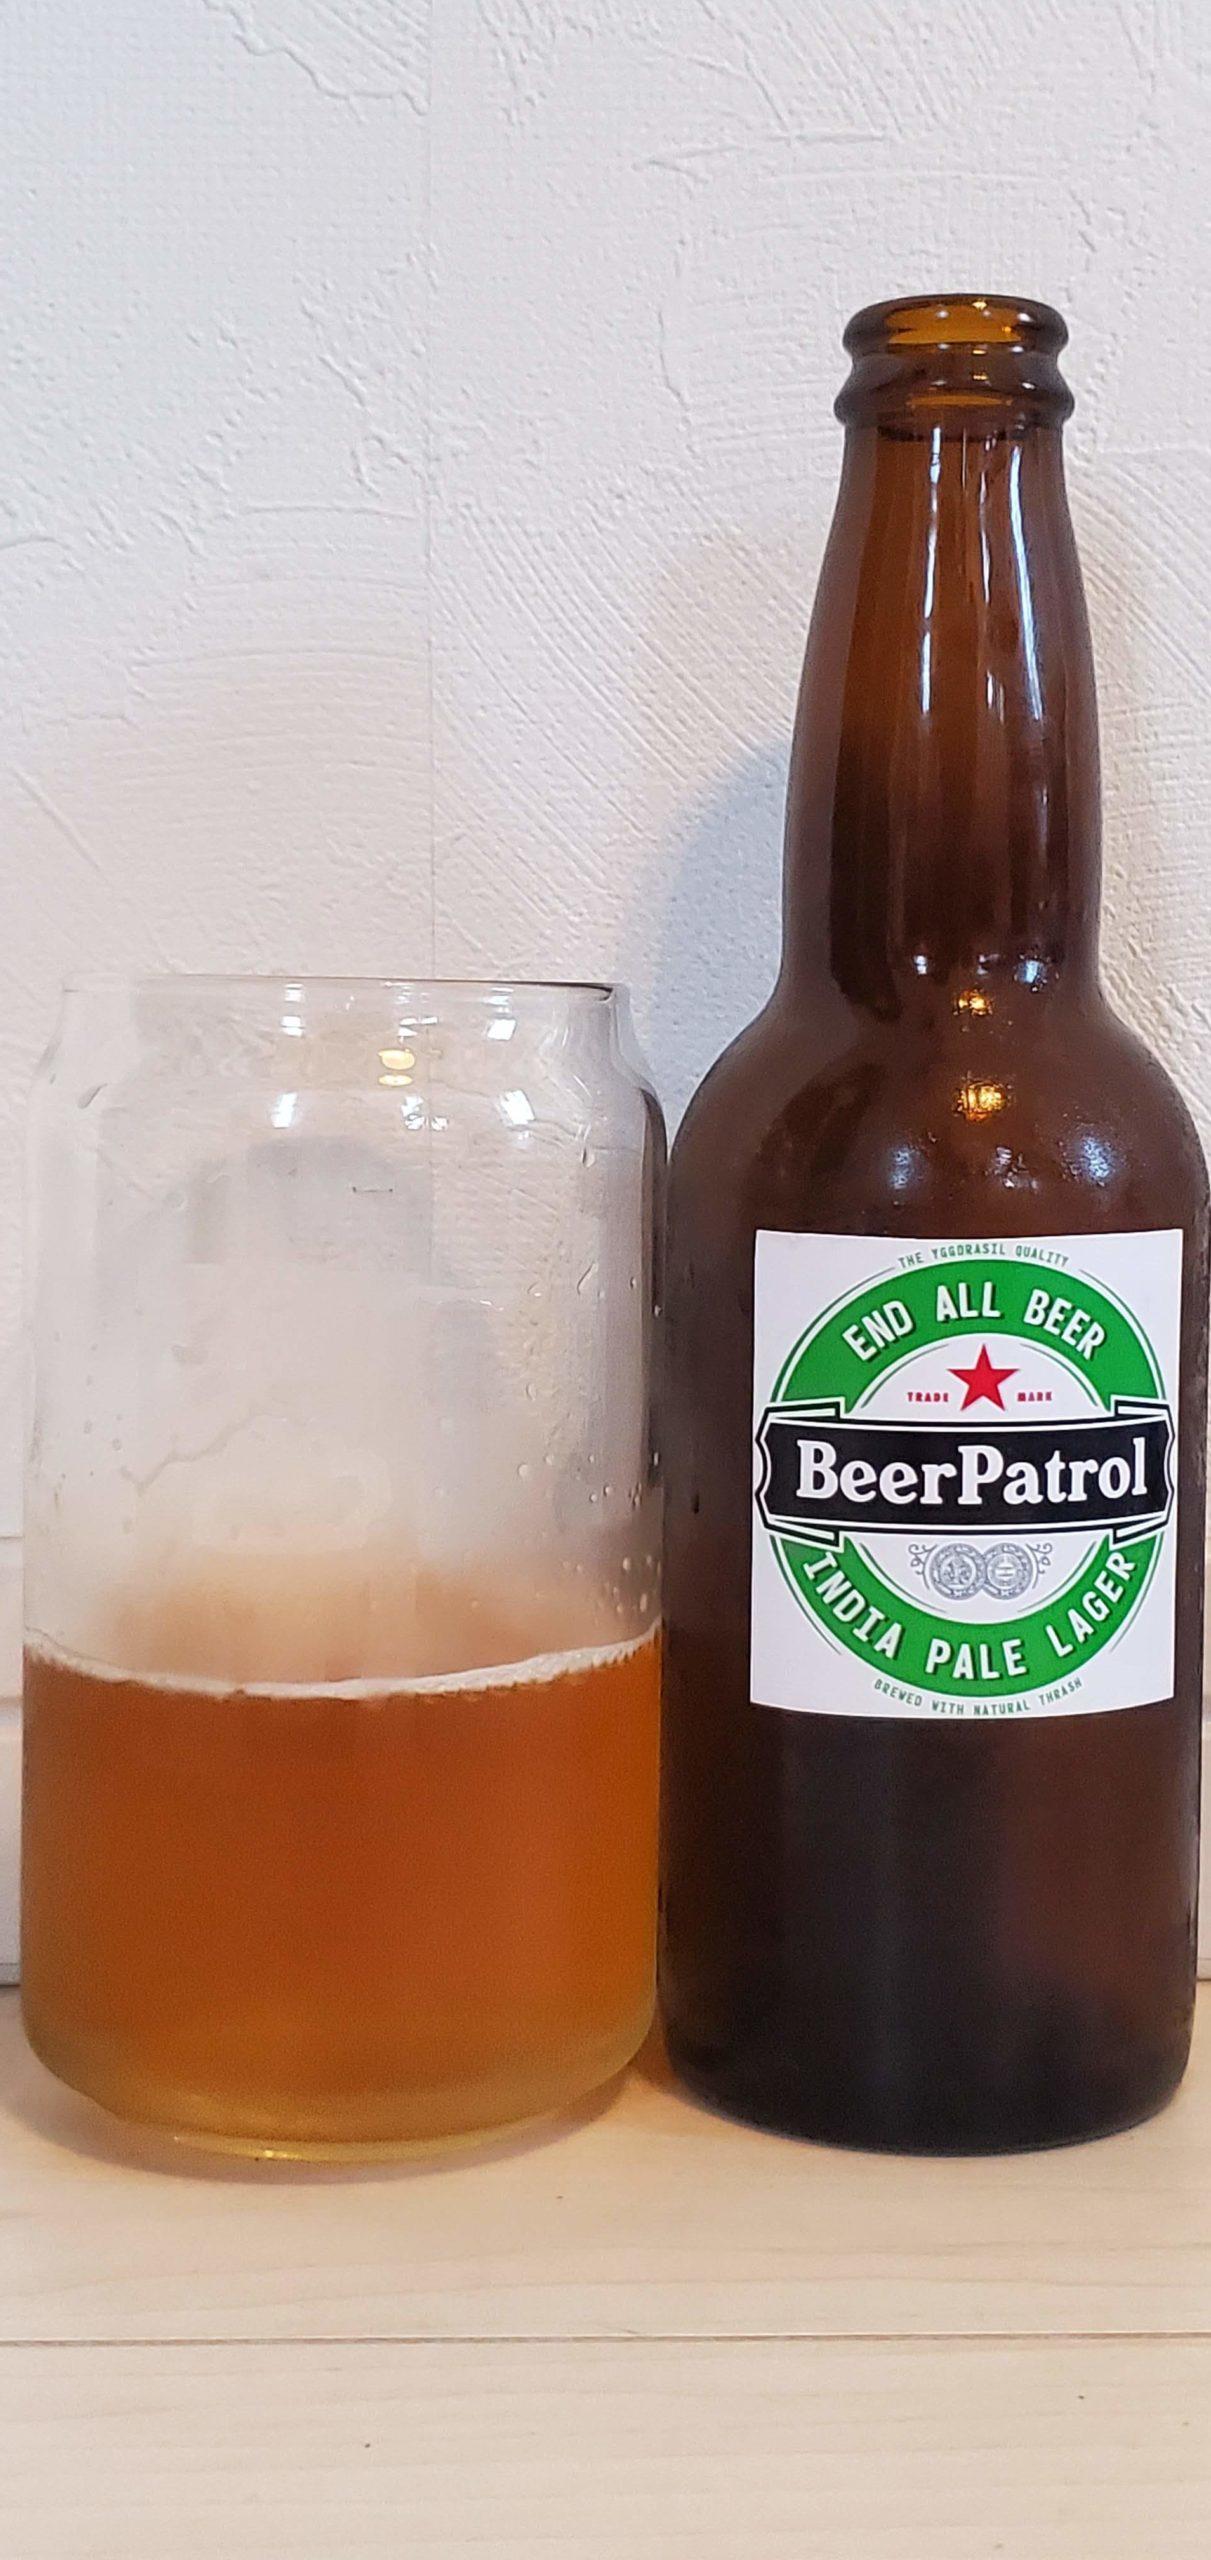 Yggdrasil Beer Patrol・イグドラジルビールパトロール